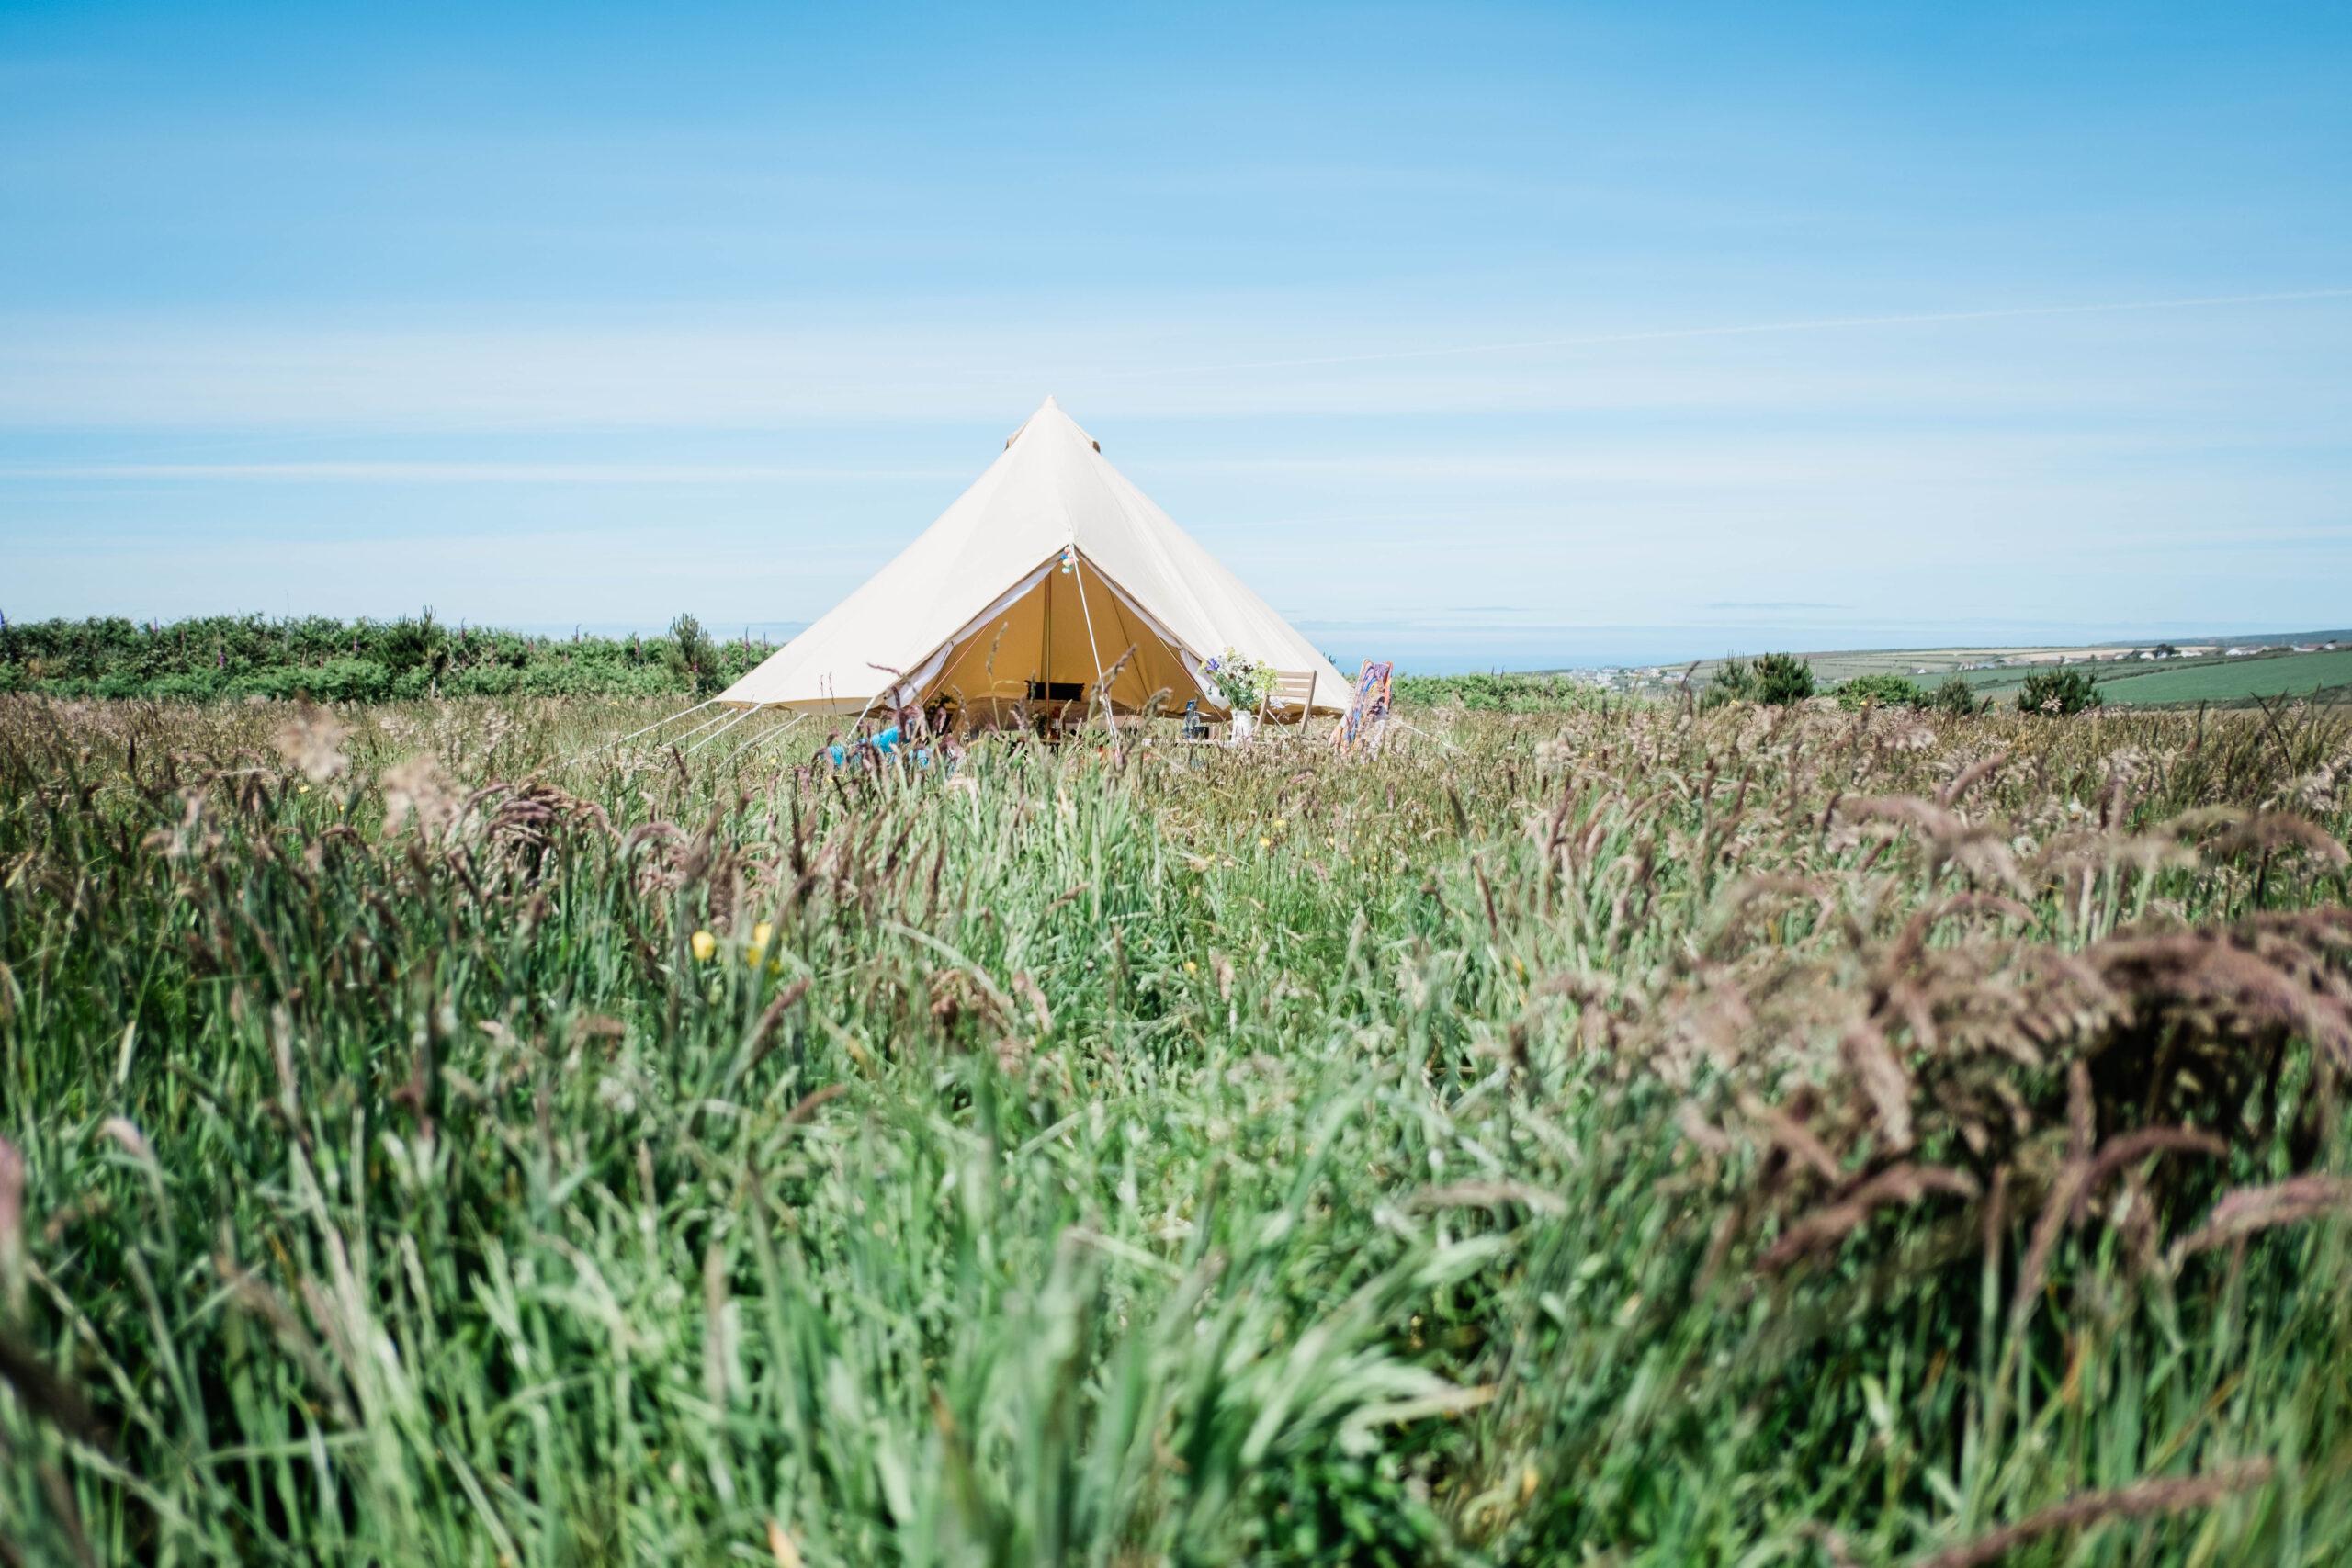 Camping Eco Park Porthtowan Cornwall